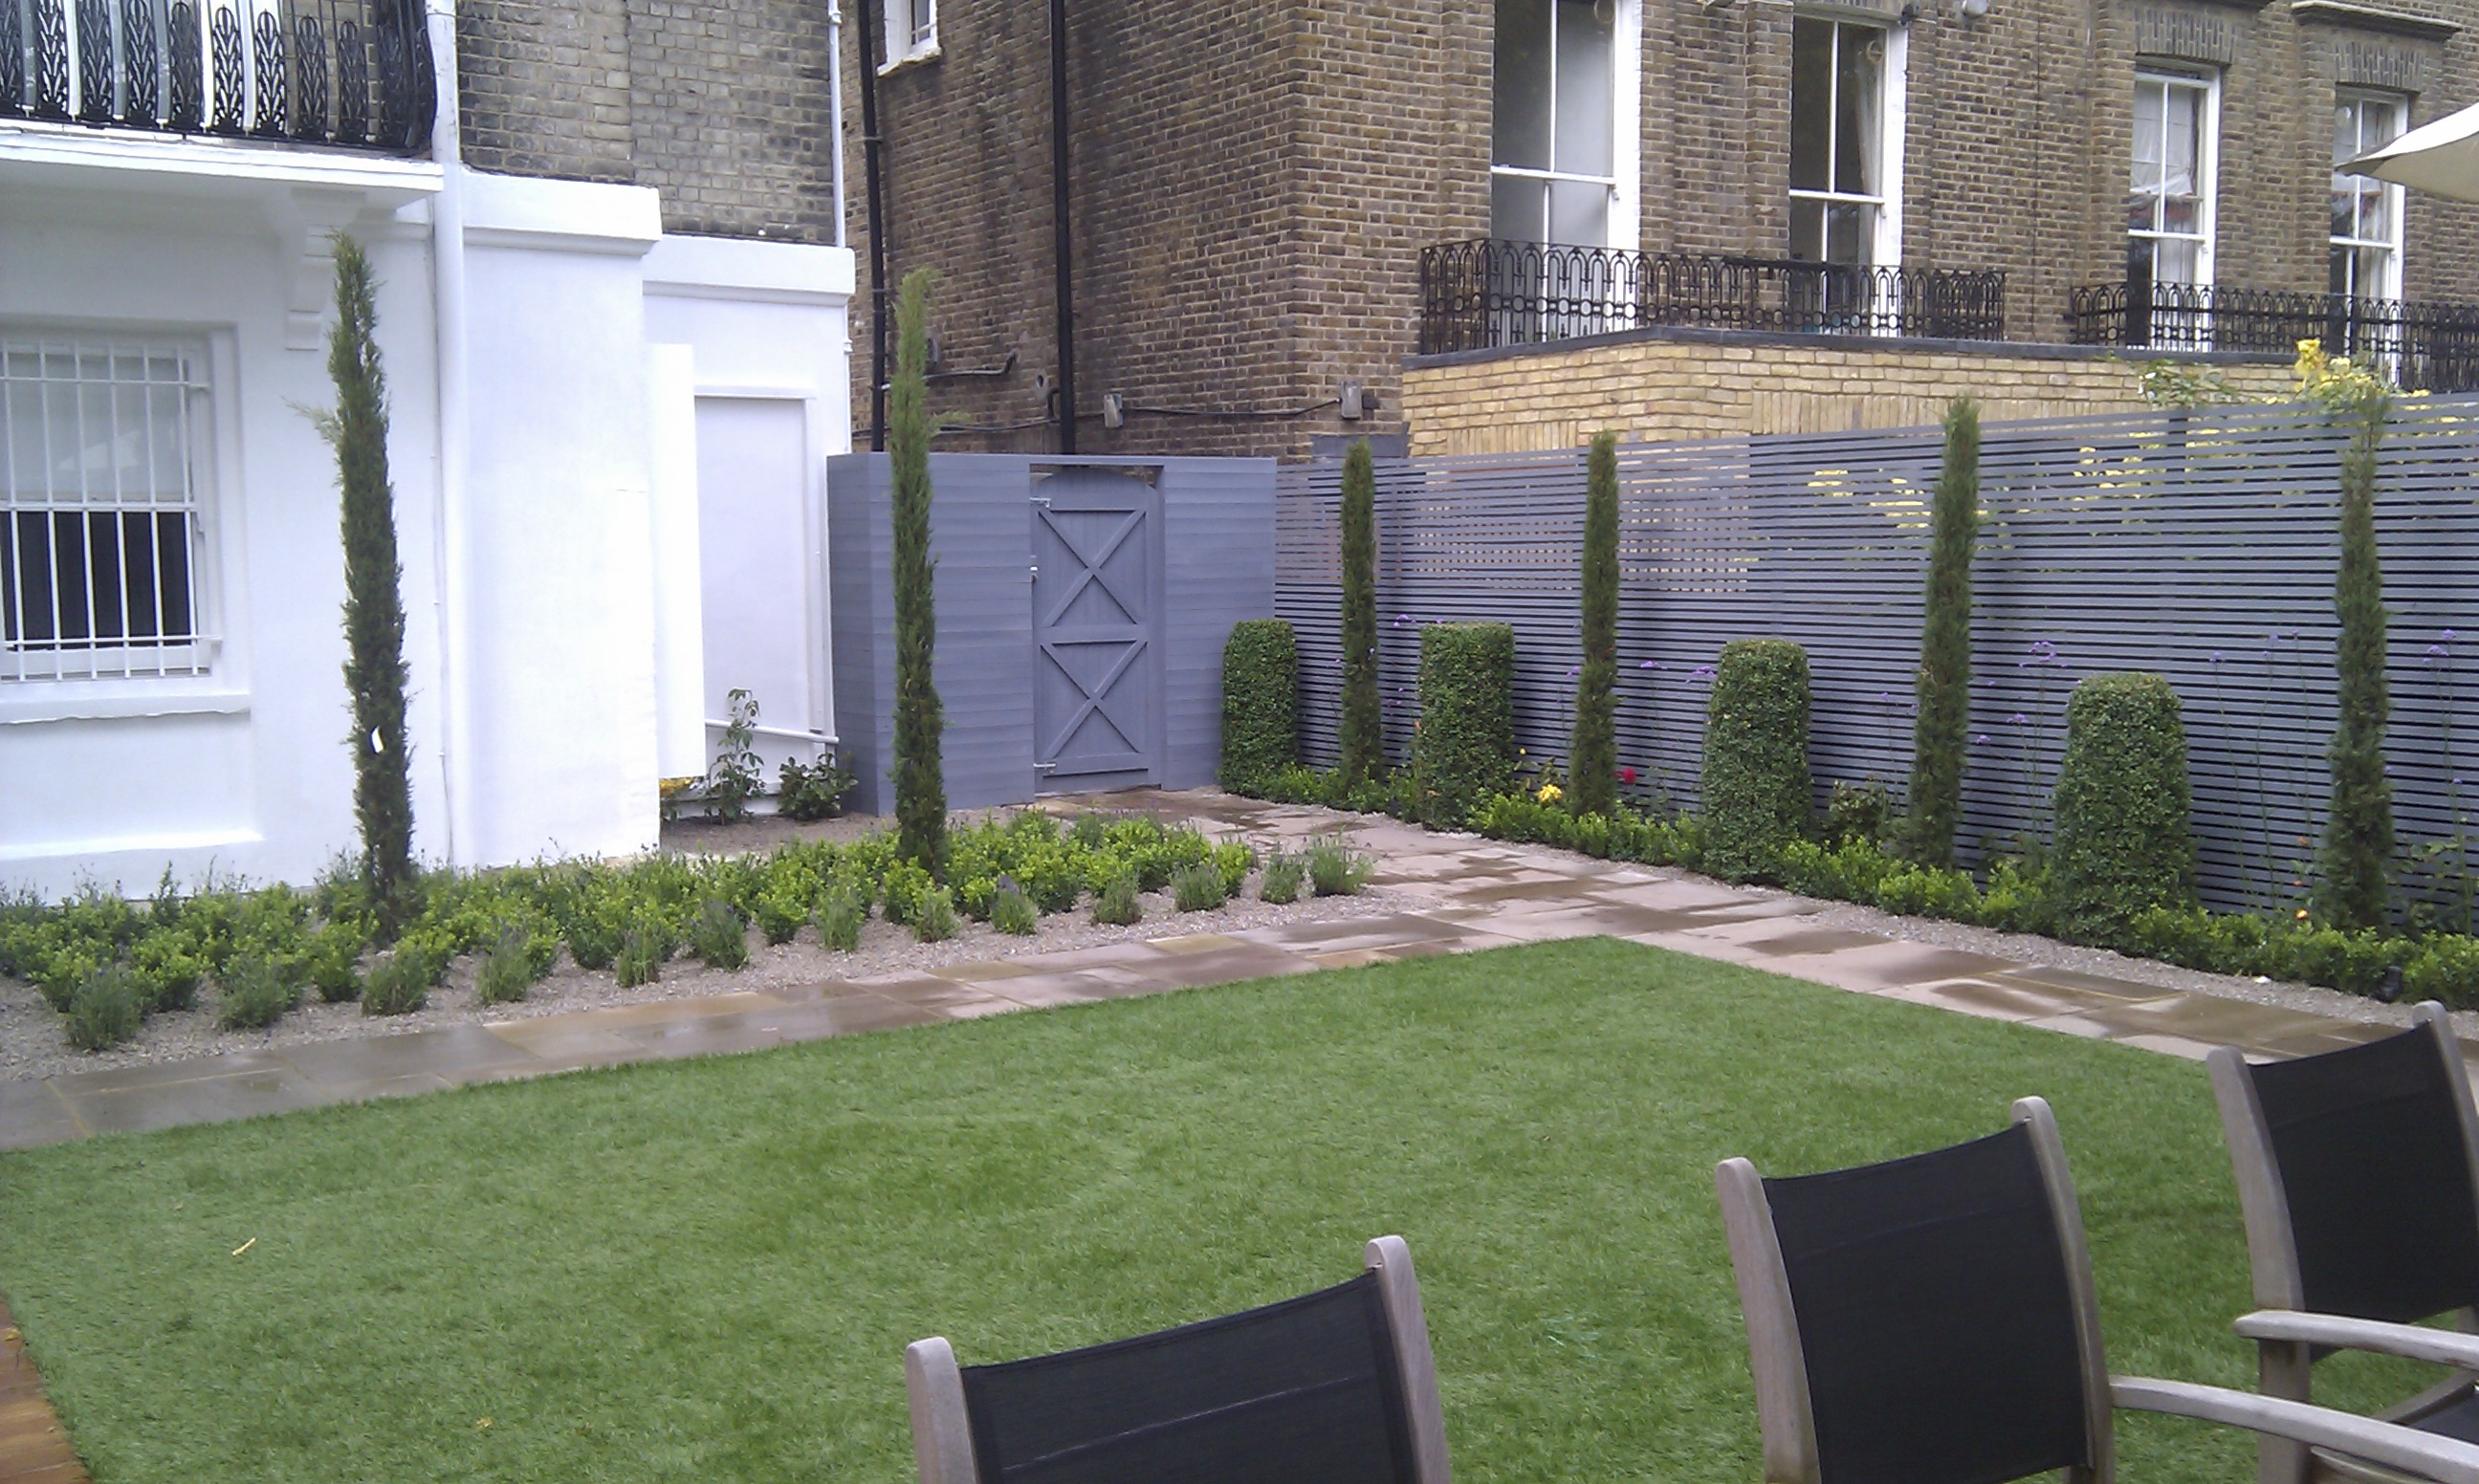 modern garden design london slatted grey privacy screen sandstone paving easy grass balau hardwood decking (10)